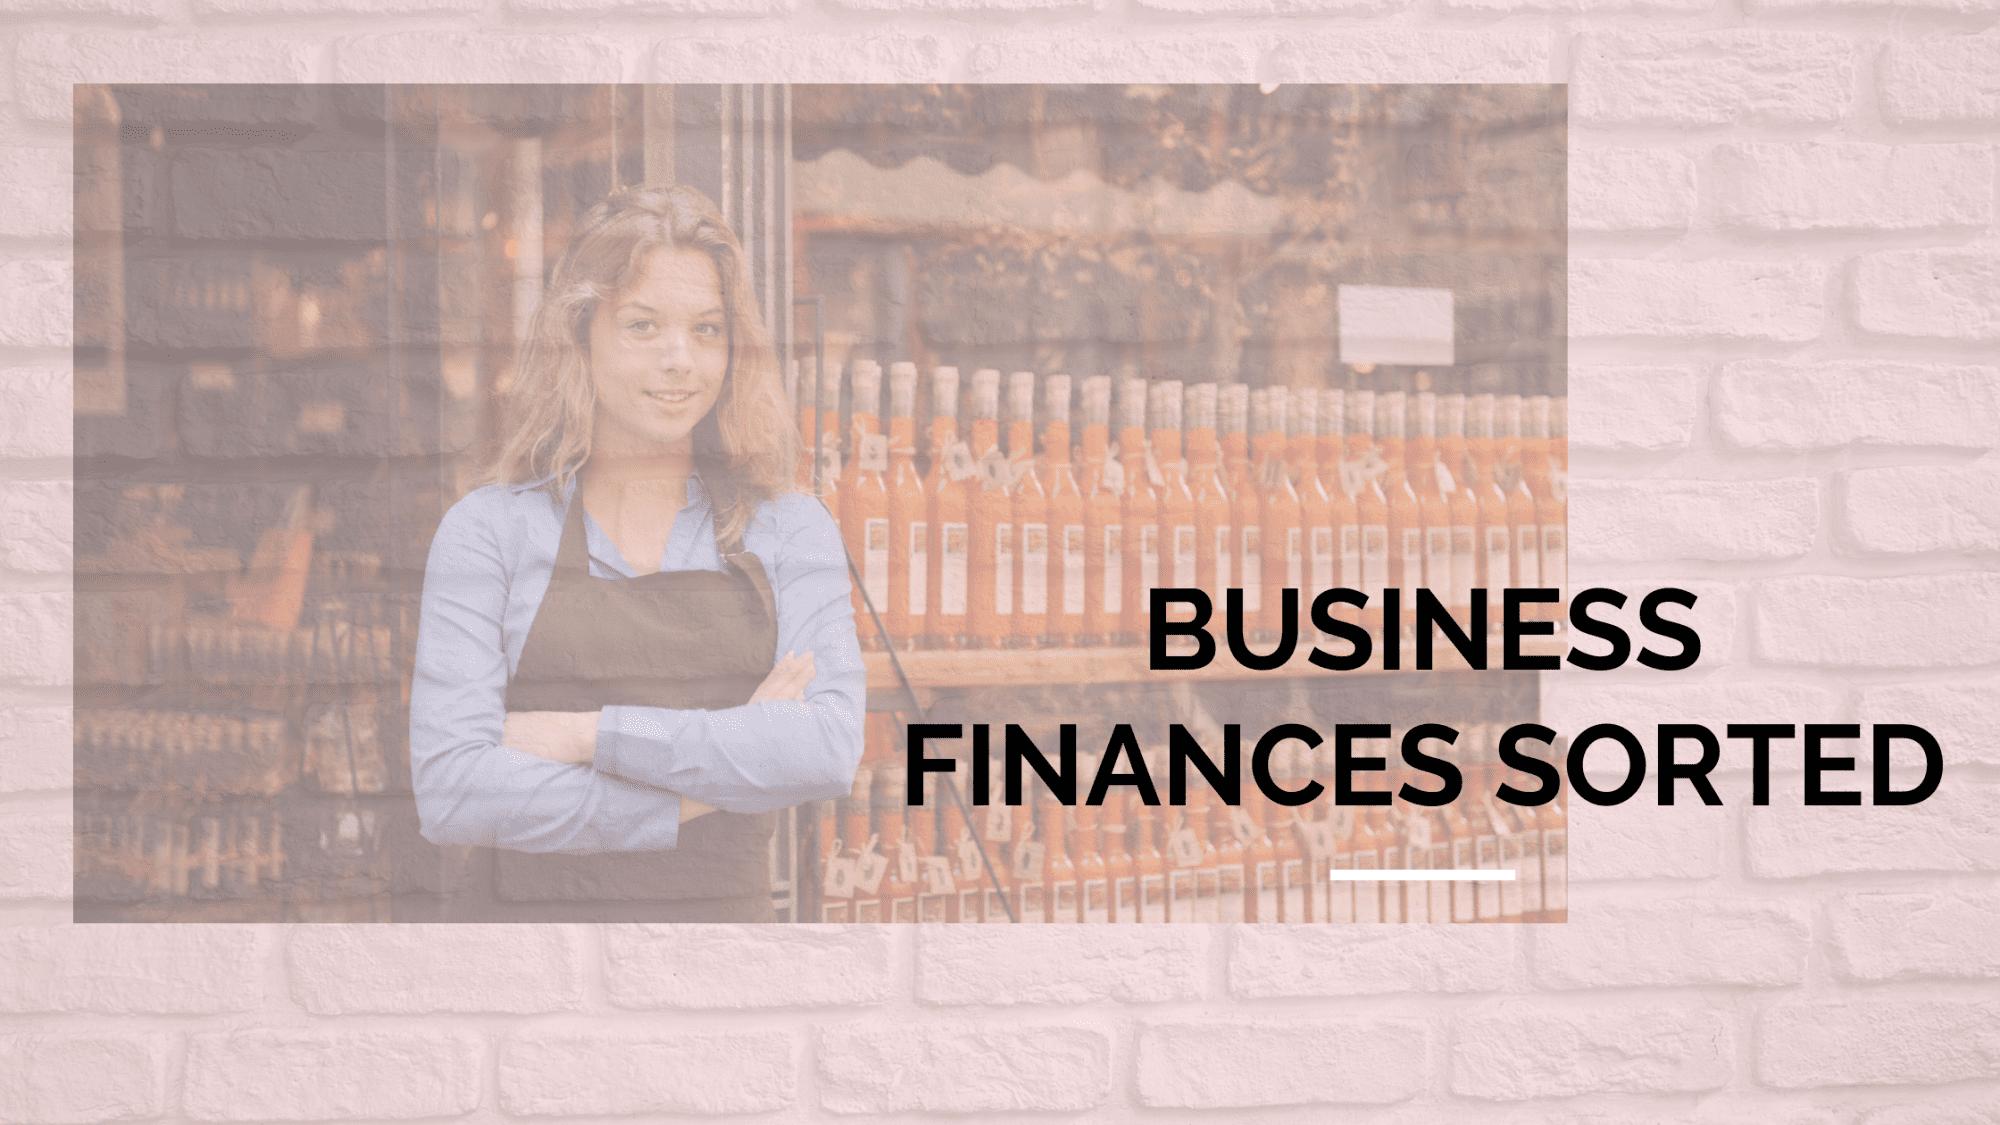 Business Finances Sorted